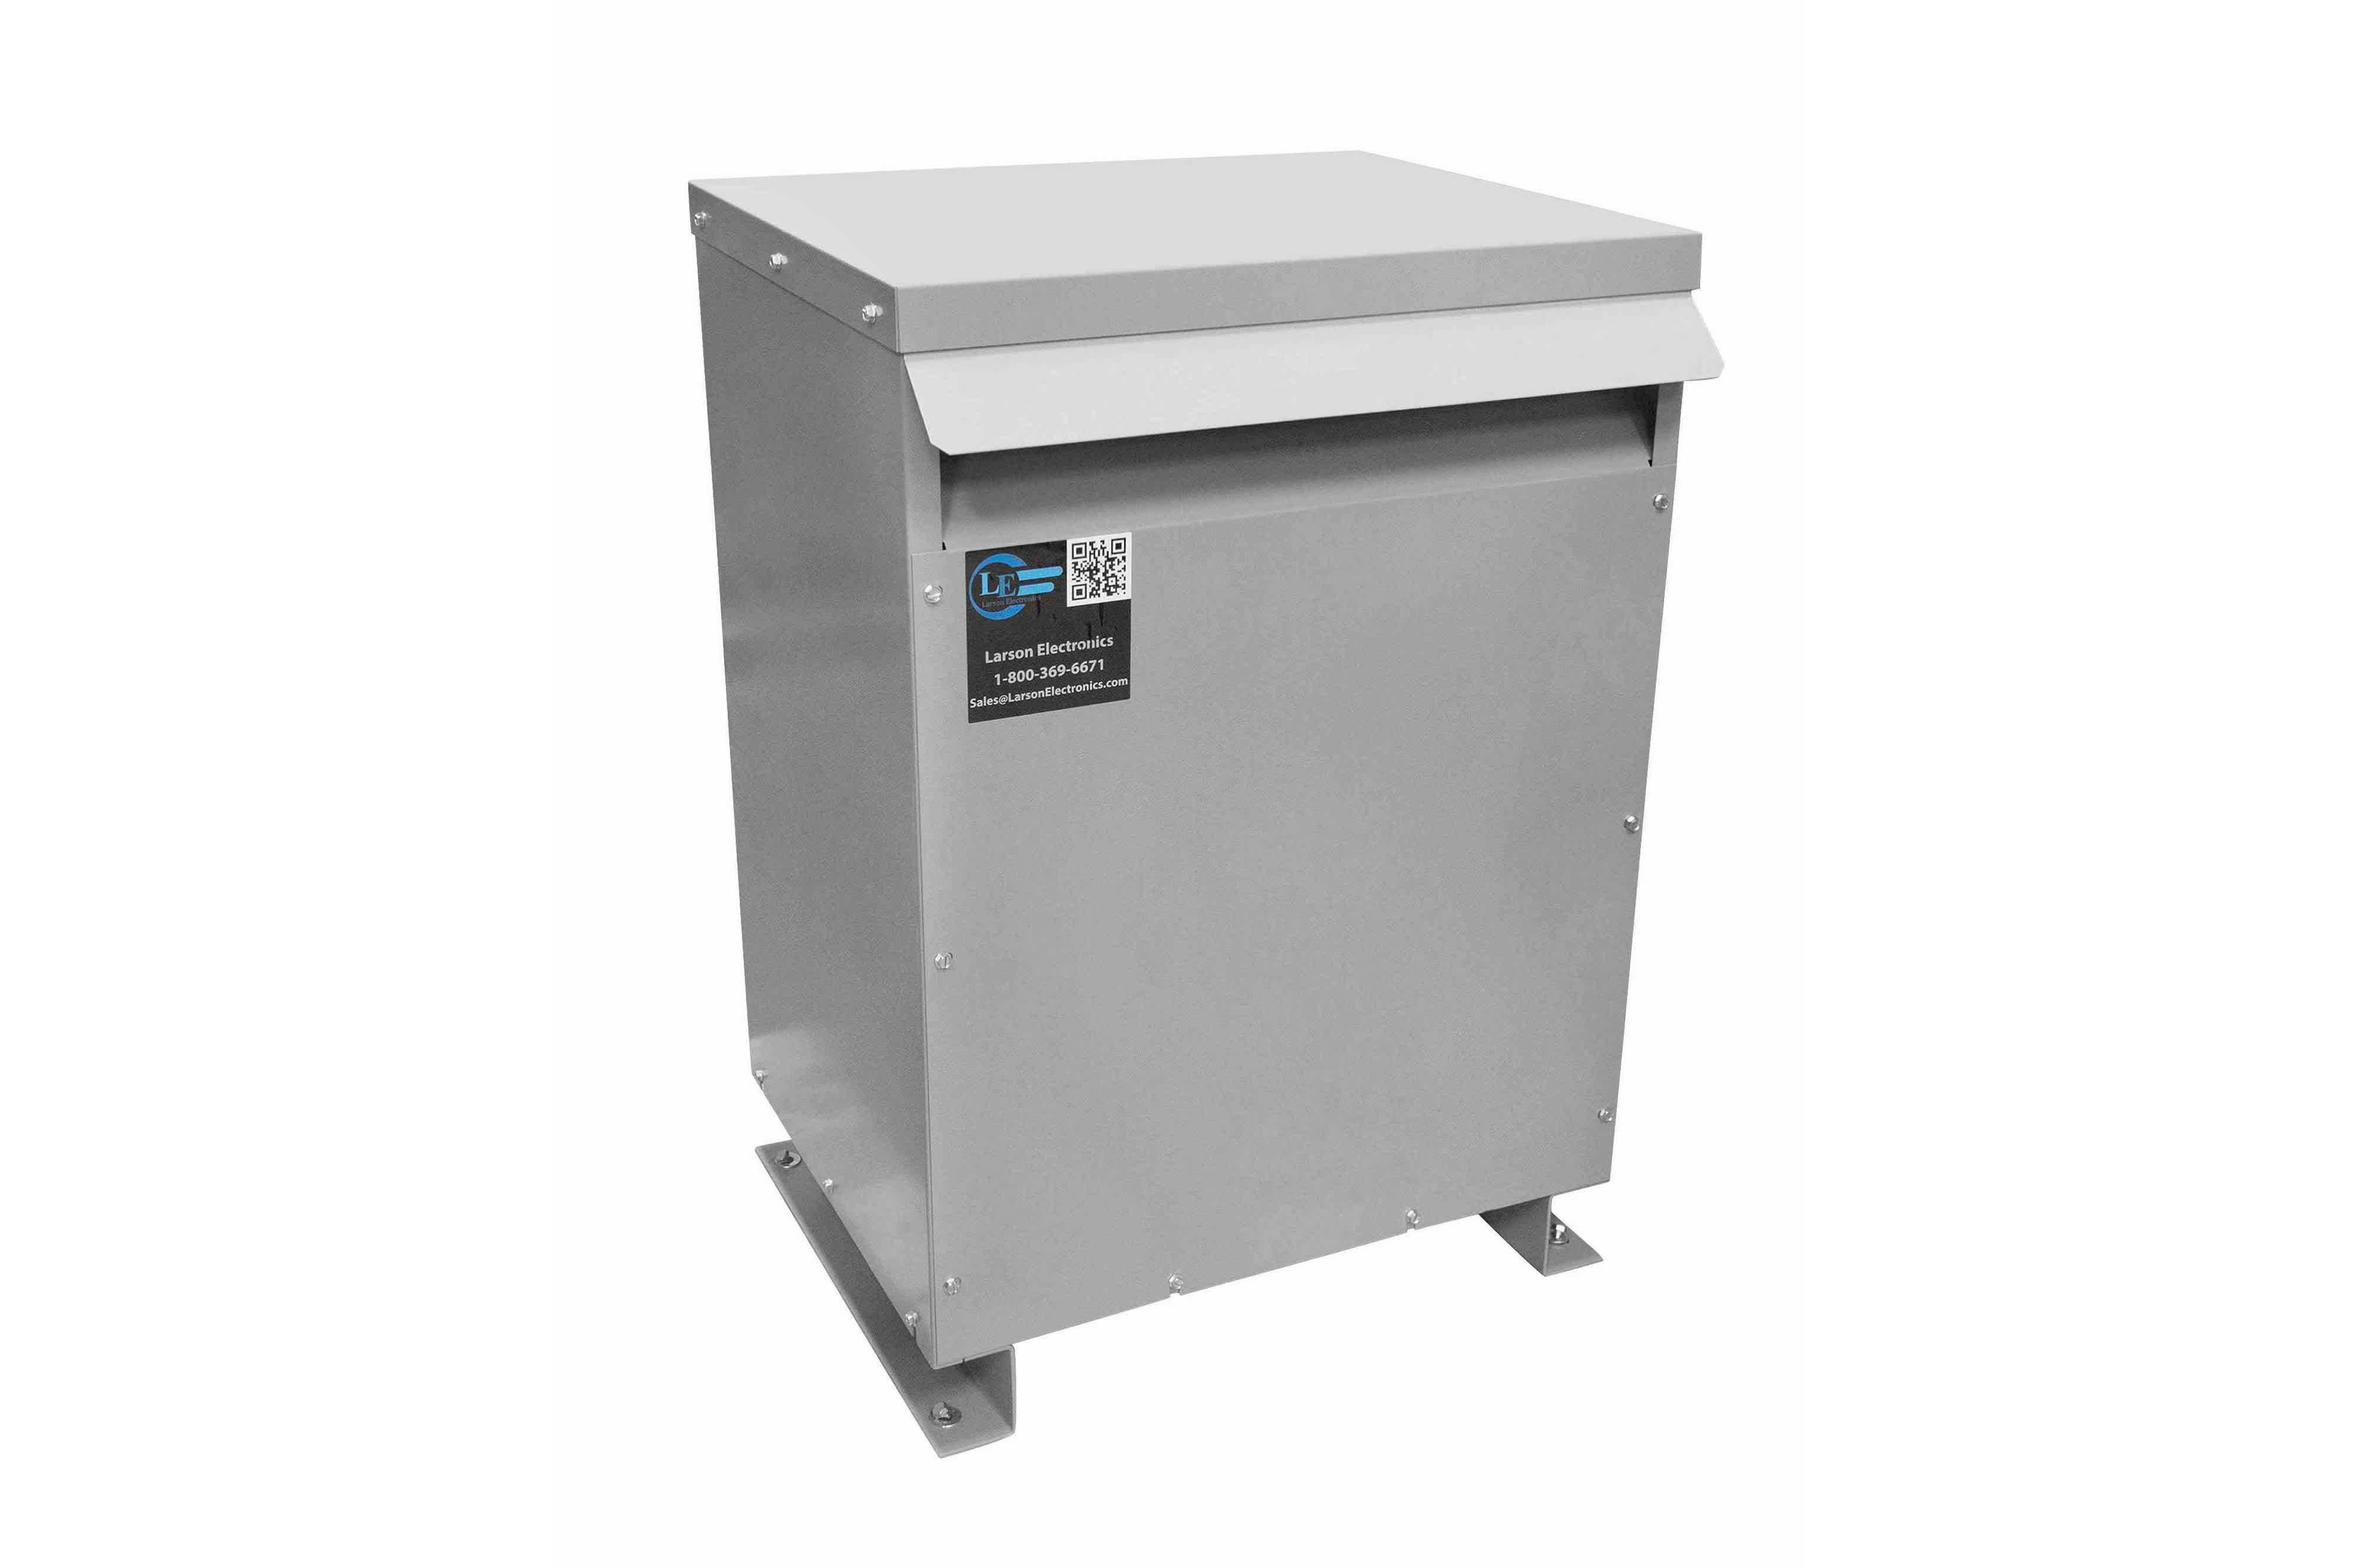 52.5 kVA 3PH Isolation Transformer, 480V Wye Primary, 575V Delta Secondary, N3R, Ventilated, 60 Hz